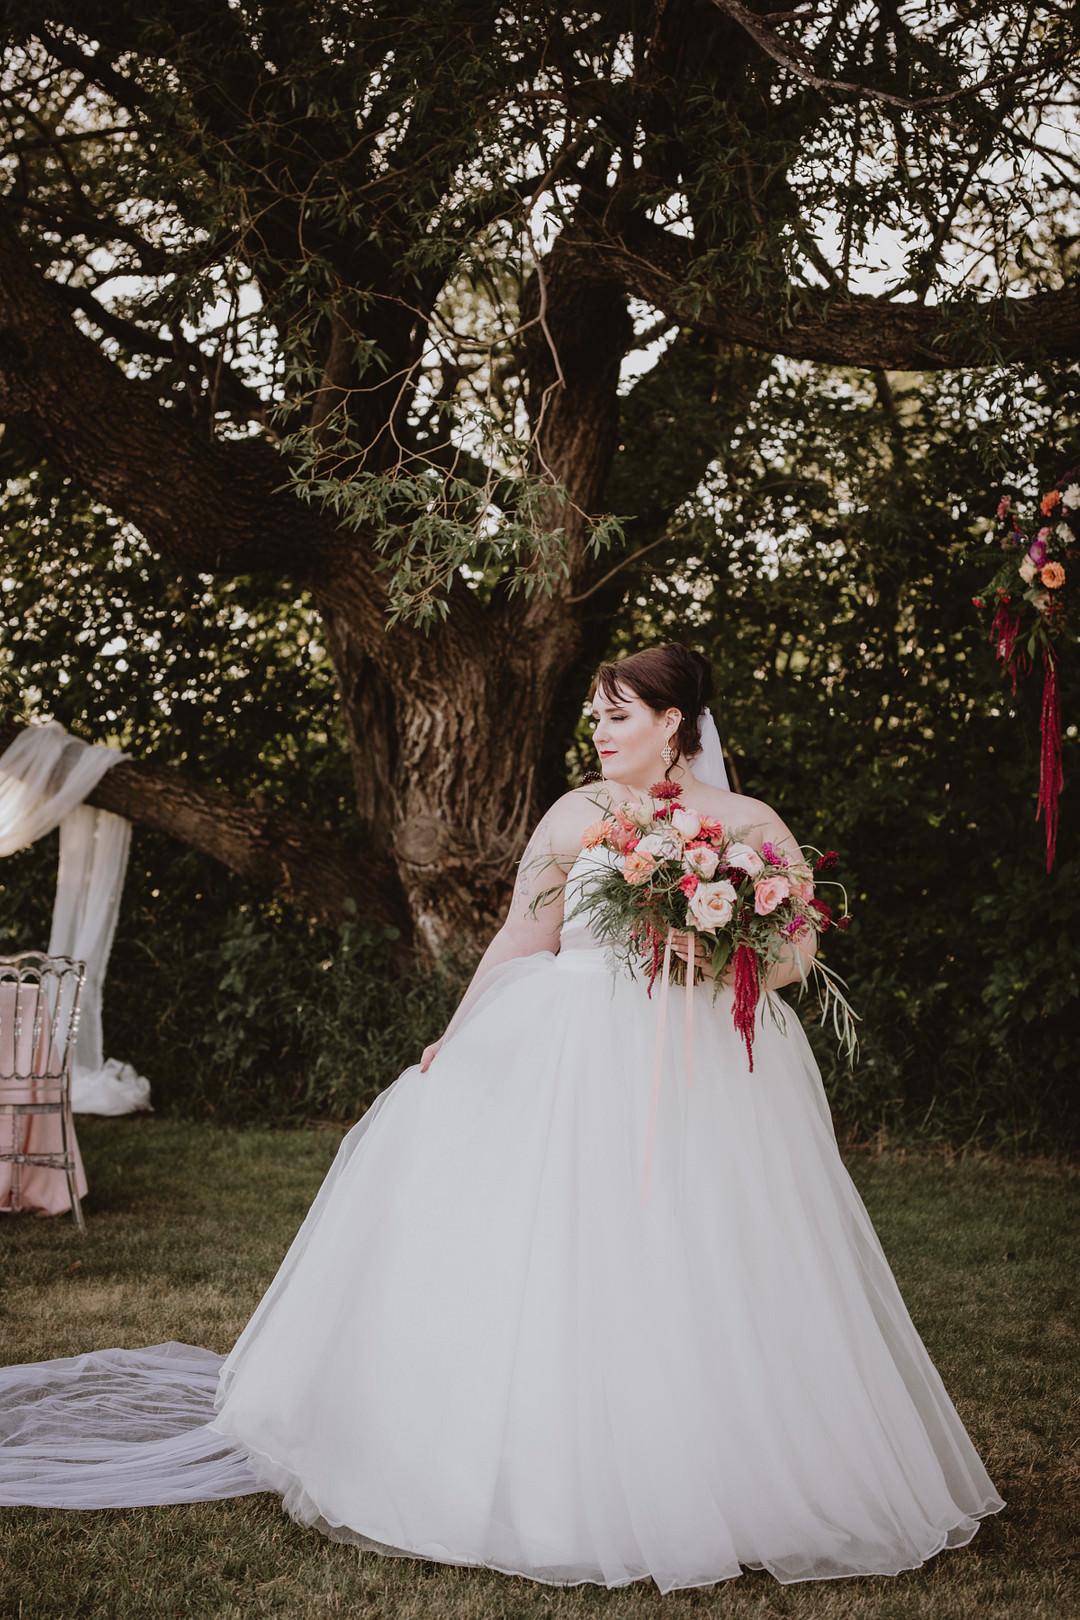 Fairytale Forest Wedding Christina W Kroeker Creative Dress Gown Bride Bridal Strapless Tulle Veil